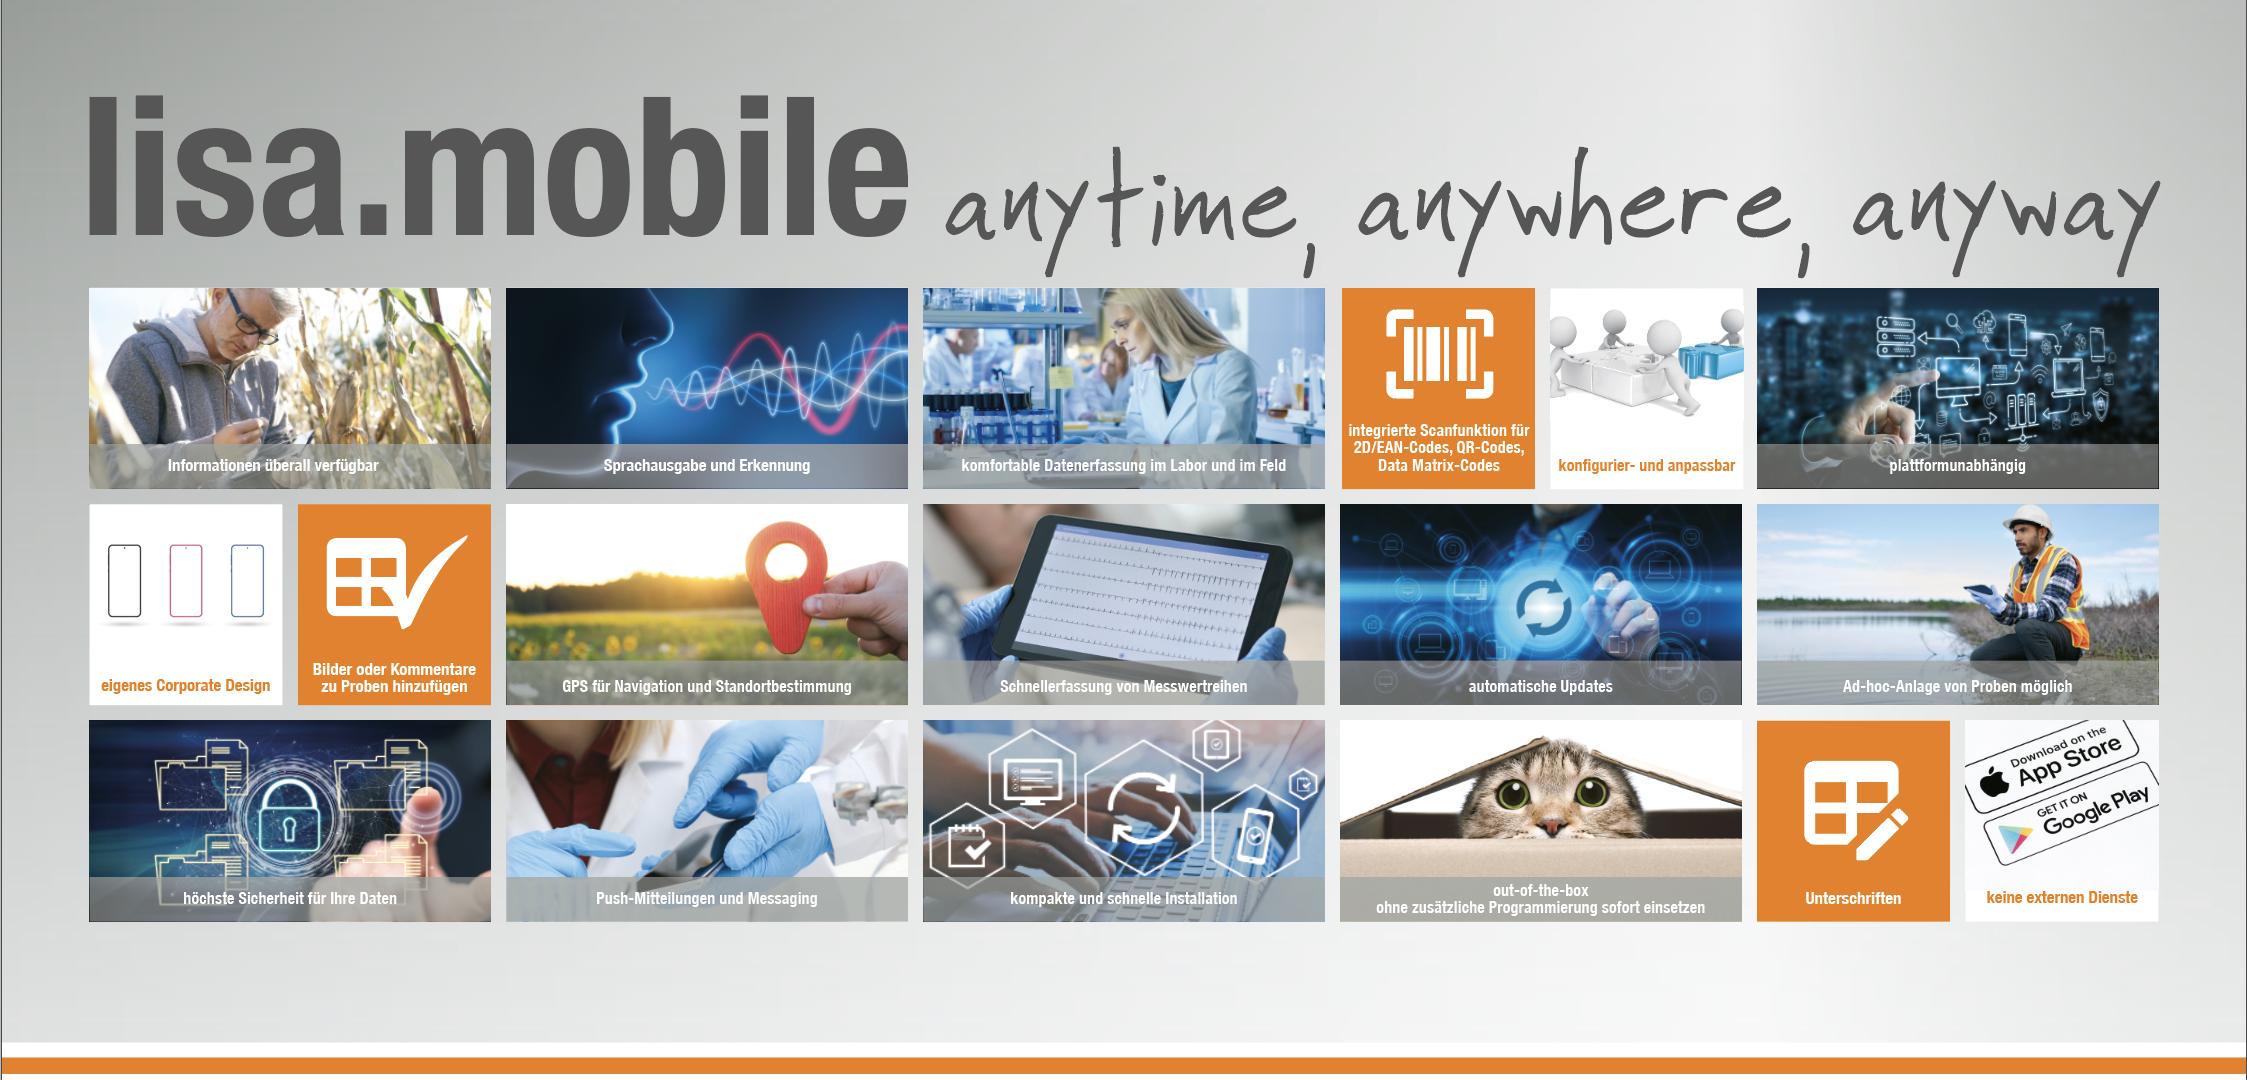 lisa.mobile - anytime, anywhere, anyway